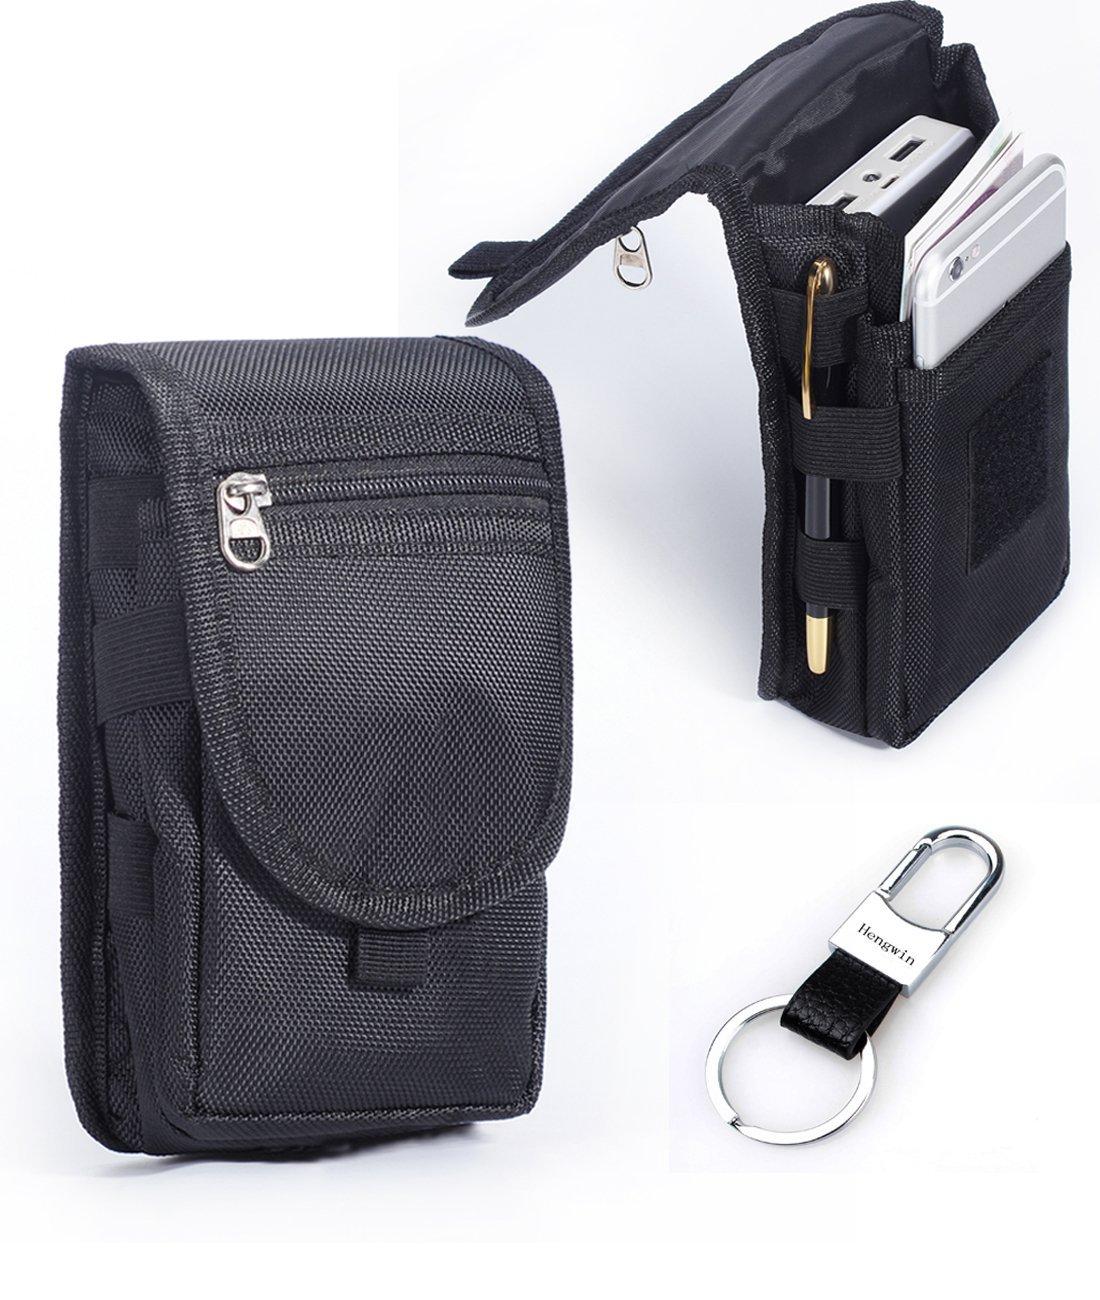 Multipurpose Large Smartphone Holster w/ Belt Loop $9.59 AC @ Amazon